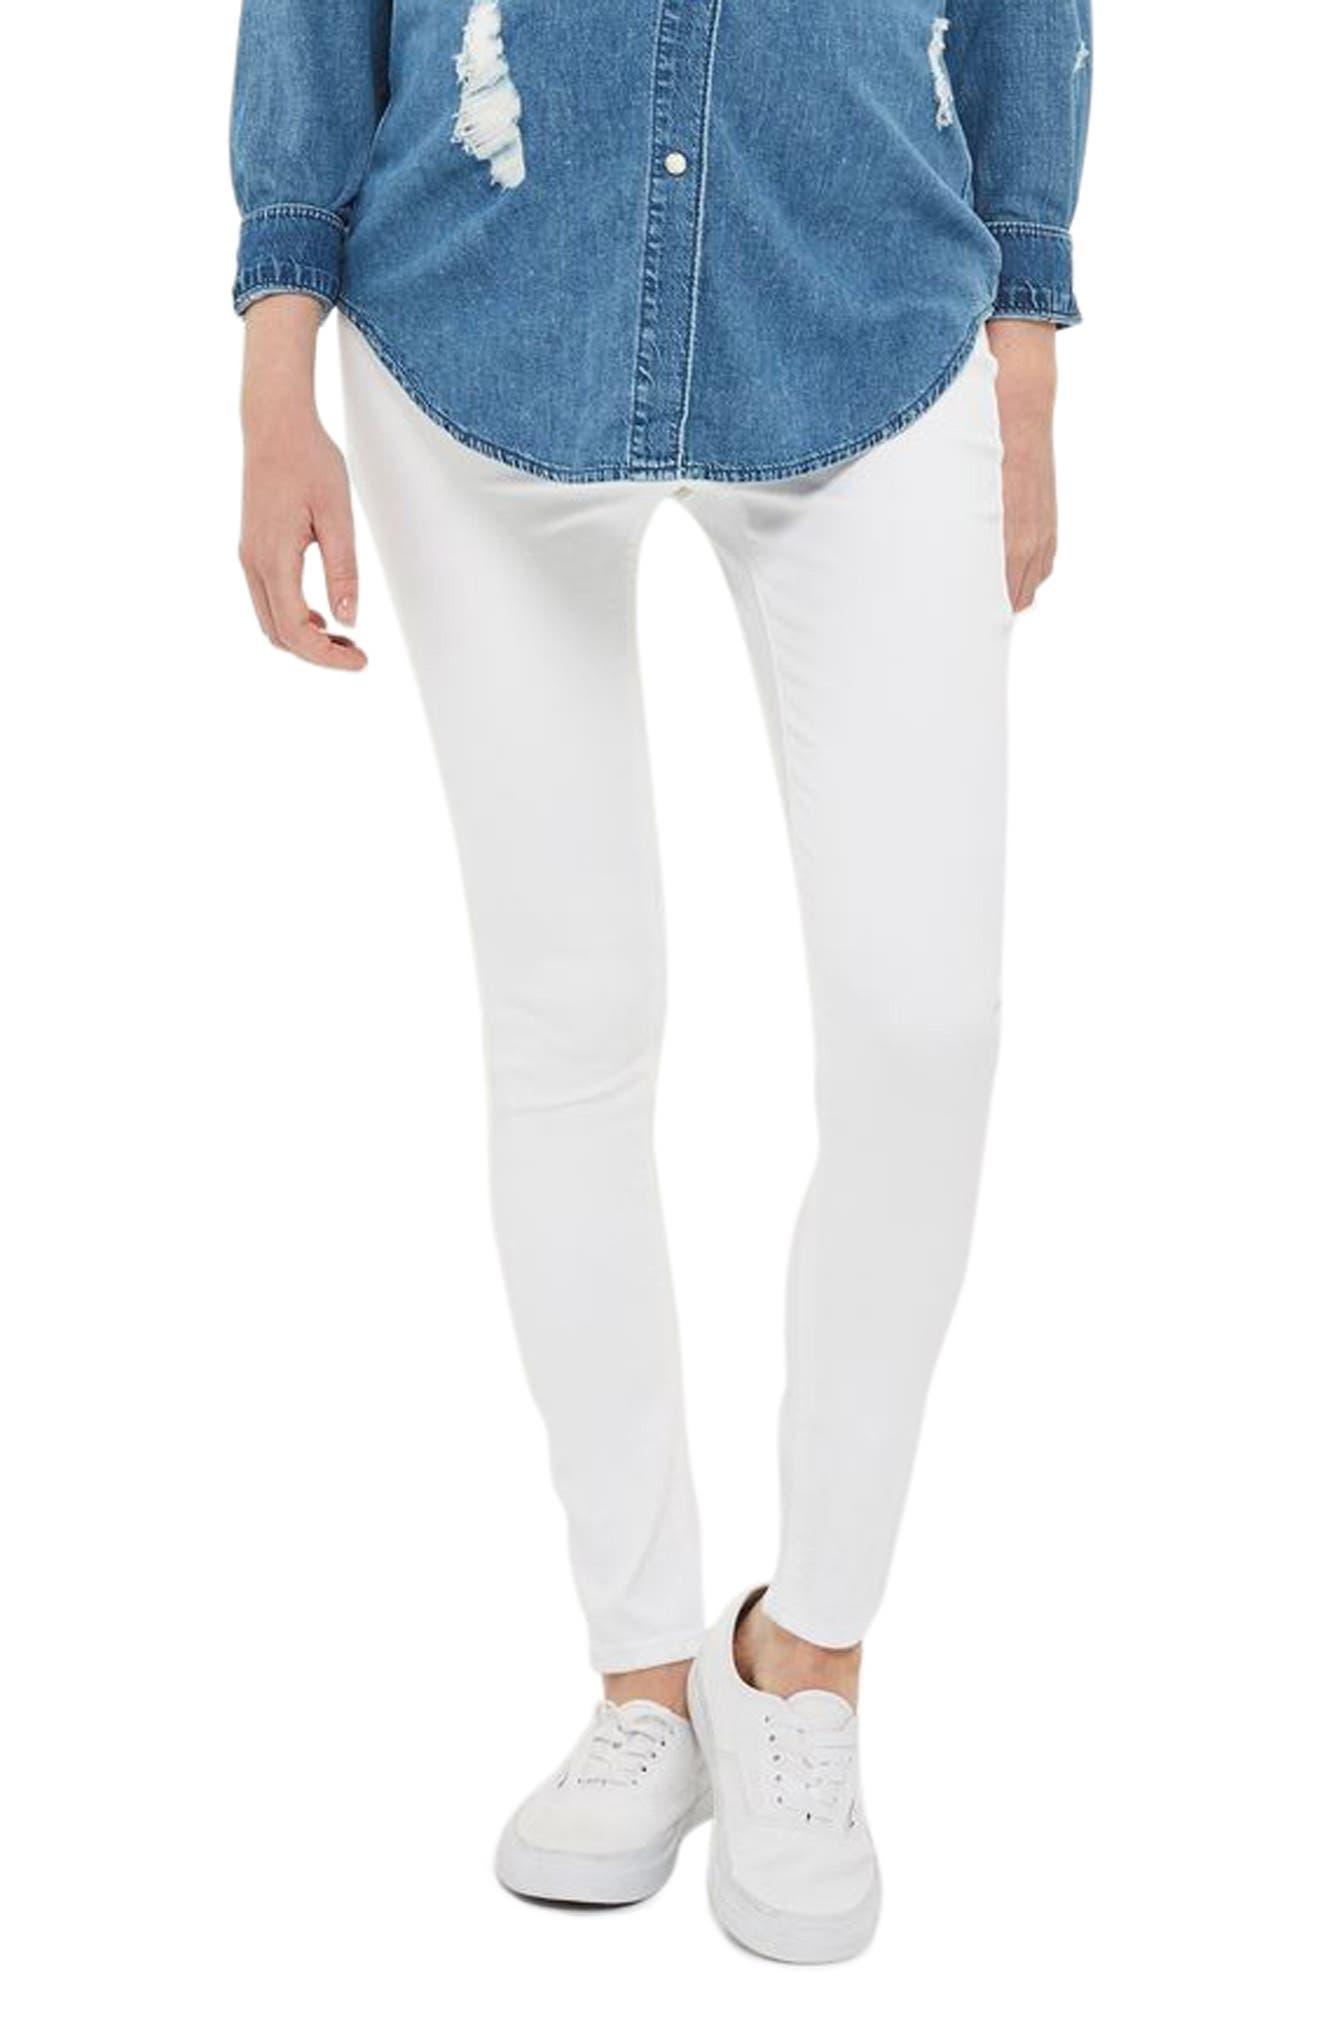 Topshop Joni Maternity Skinny Jeans